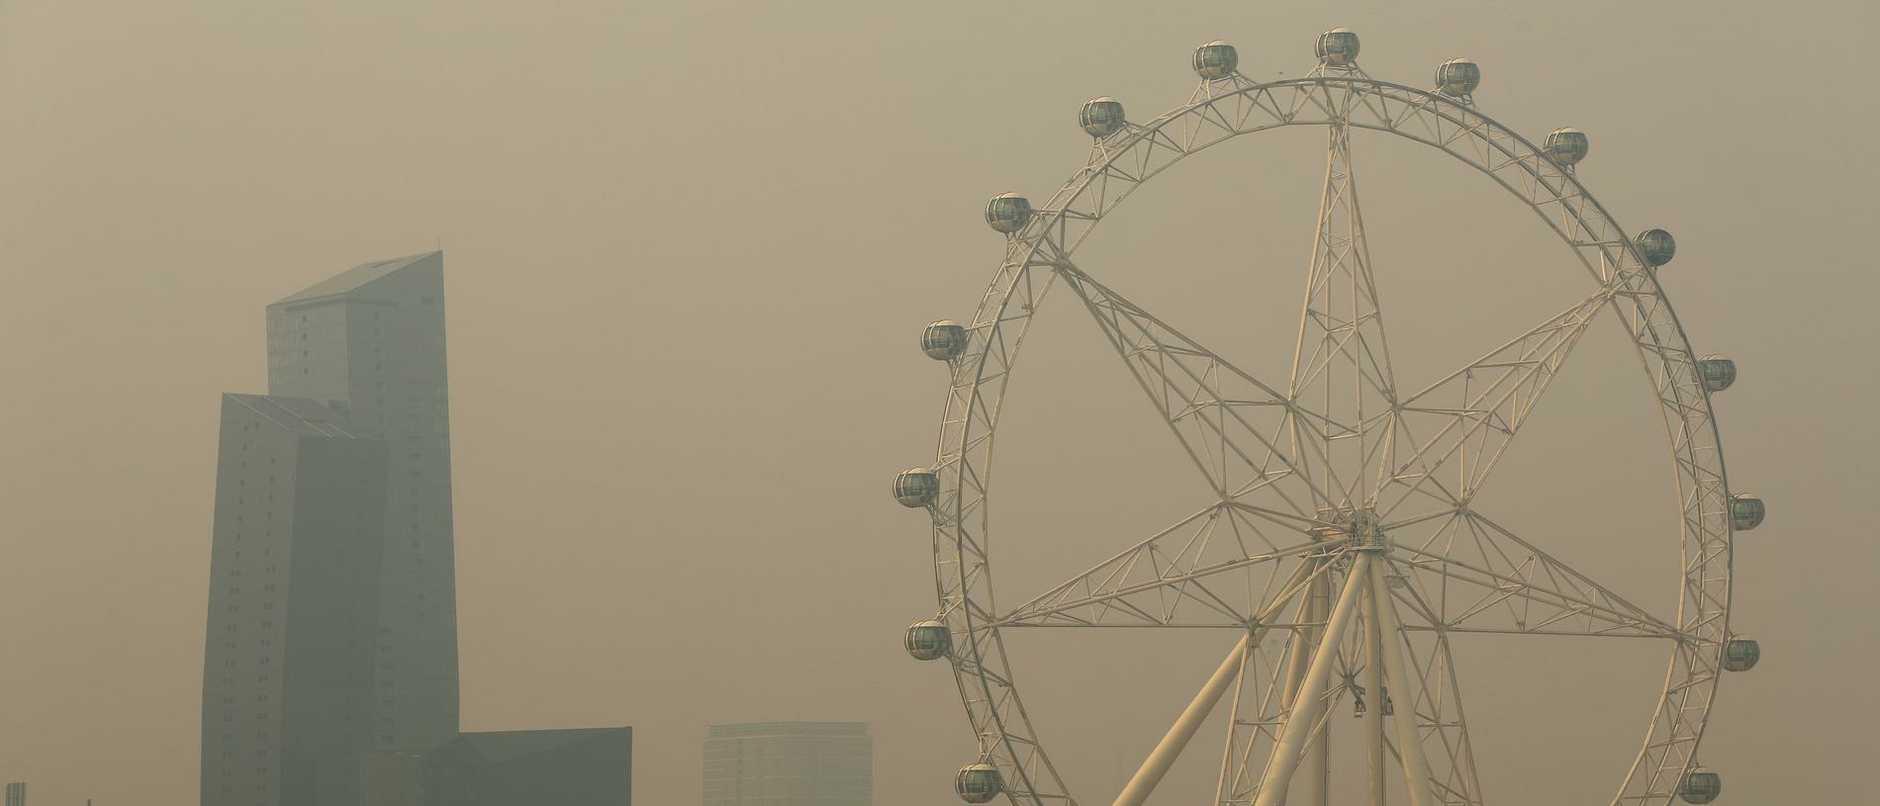 Bushfire Smoke Haze Blankets Melbourne